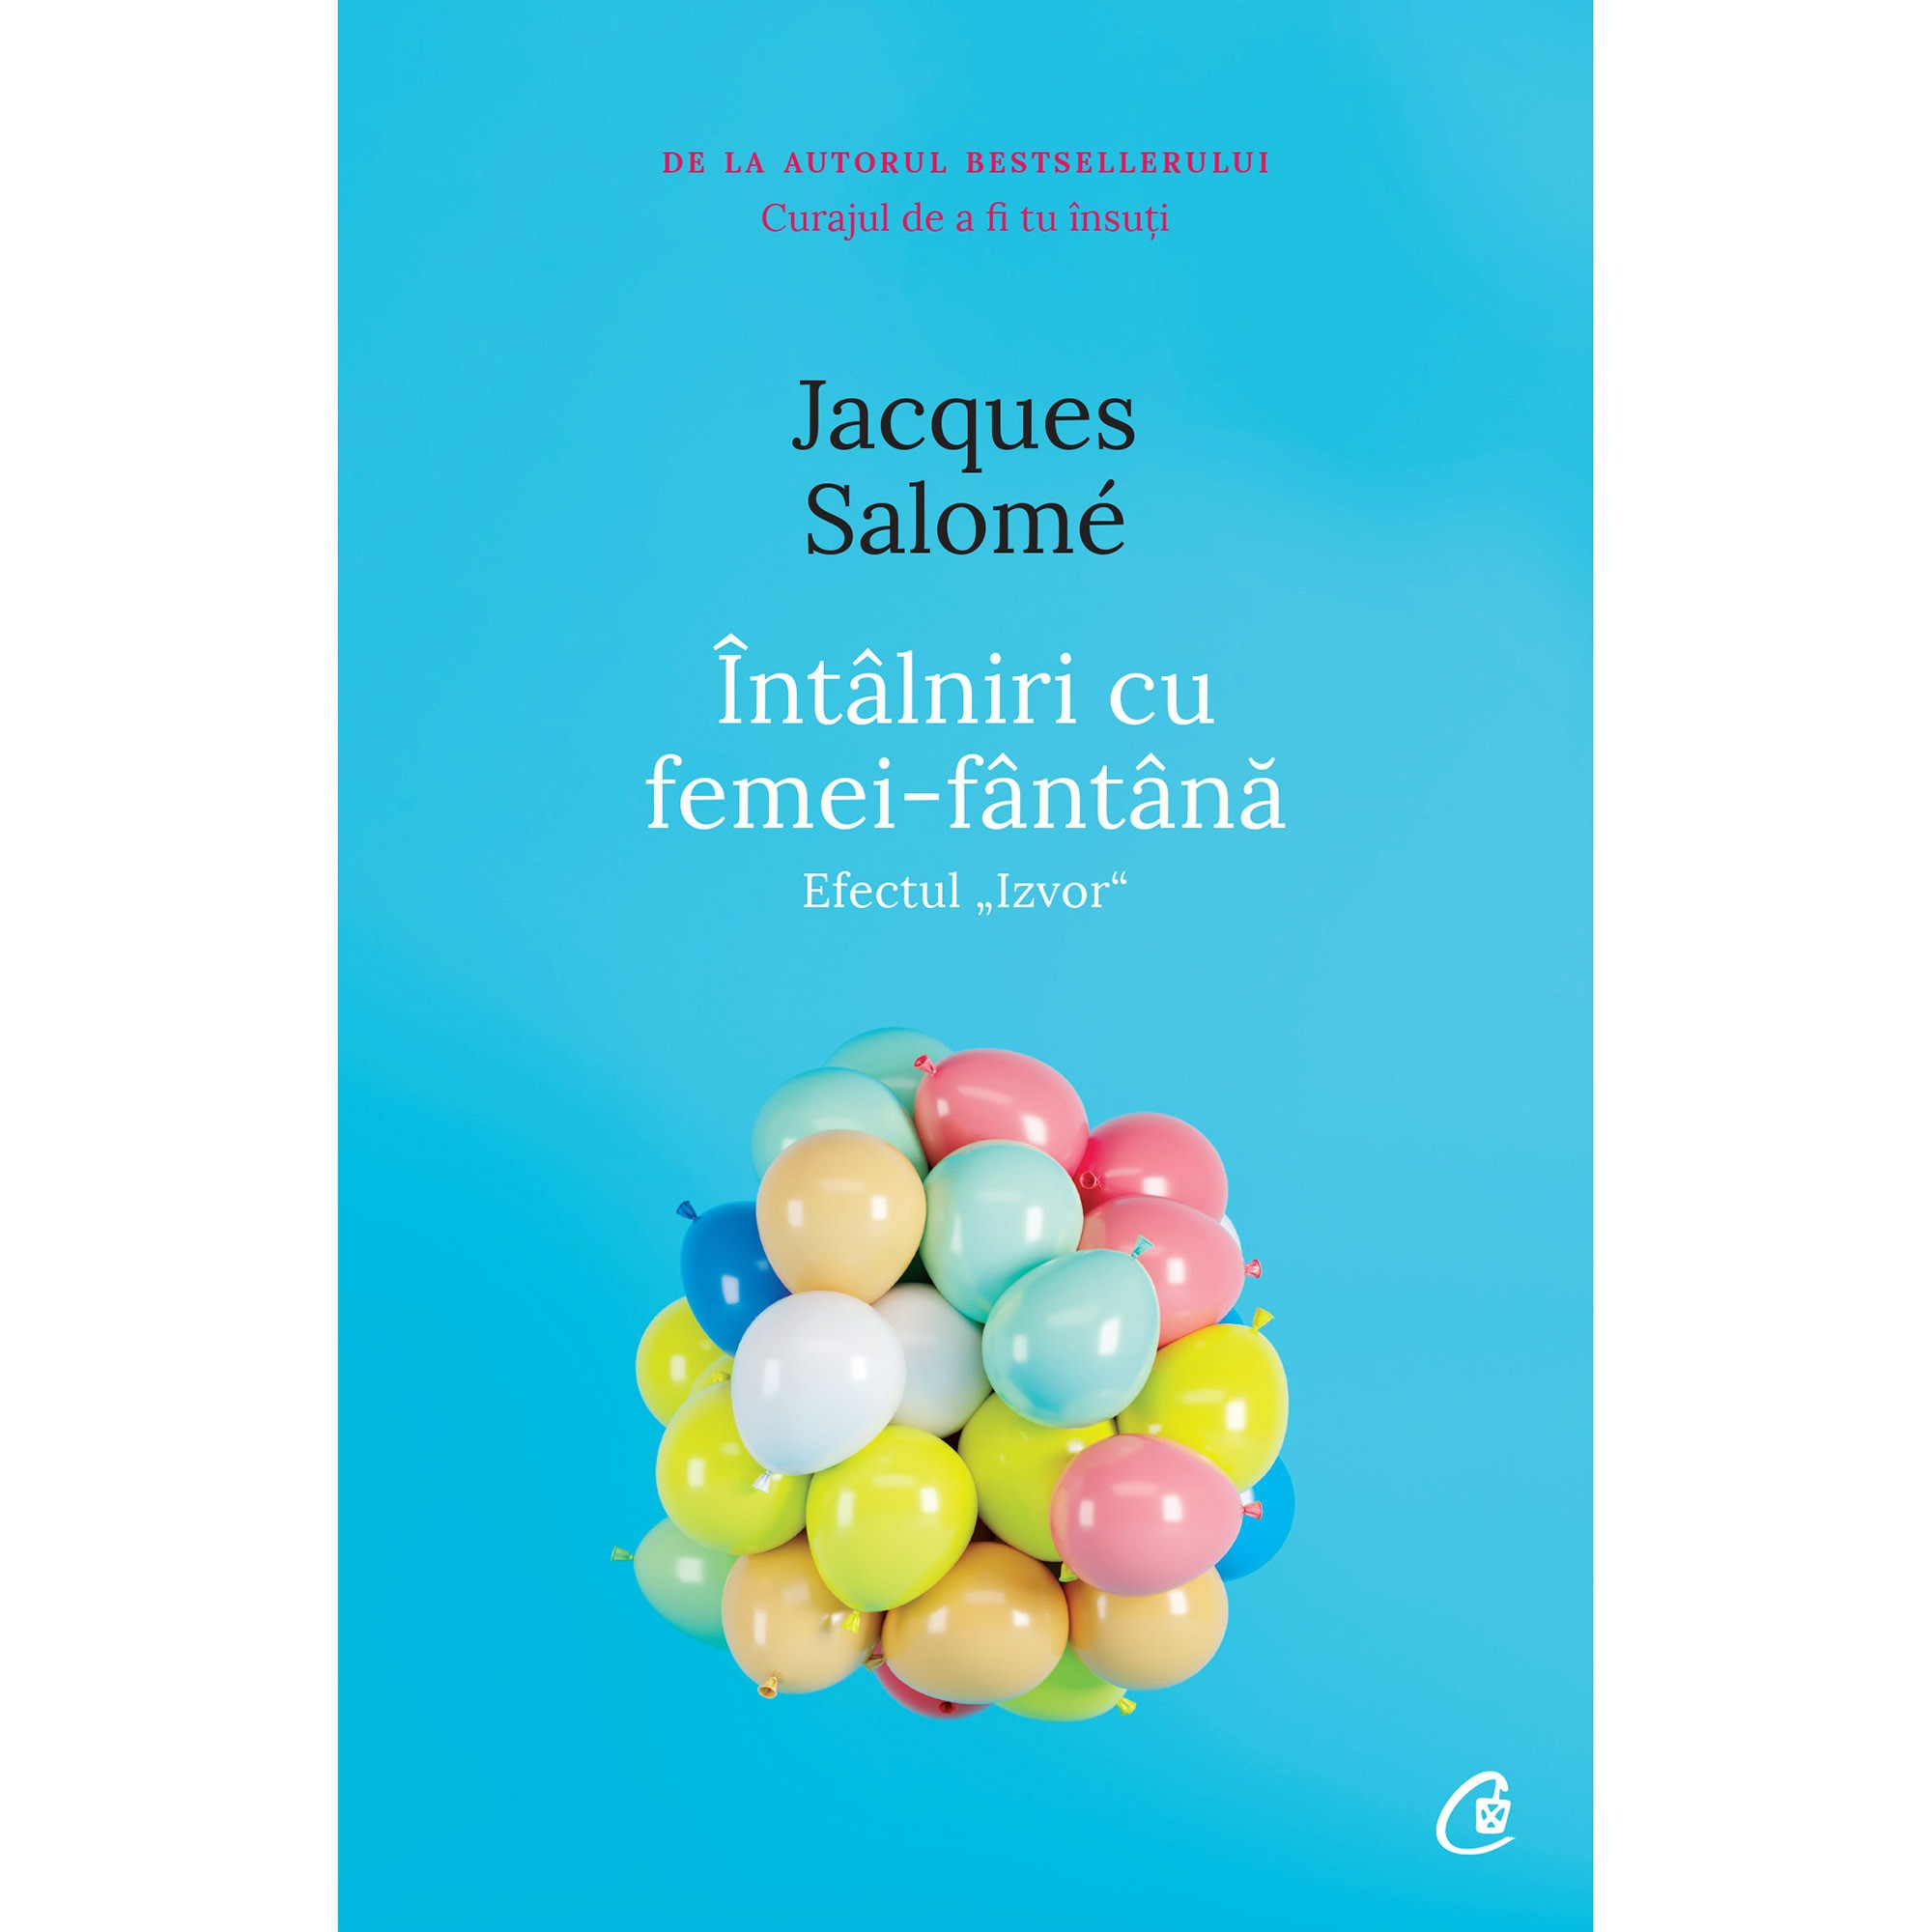 Intalniri cu femei fantana de Jacques Salome - Diverta